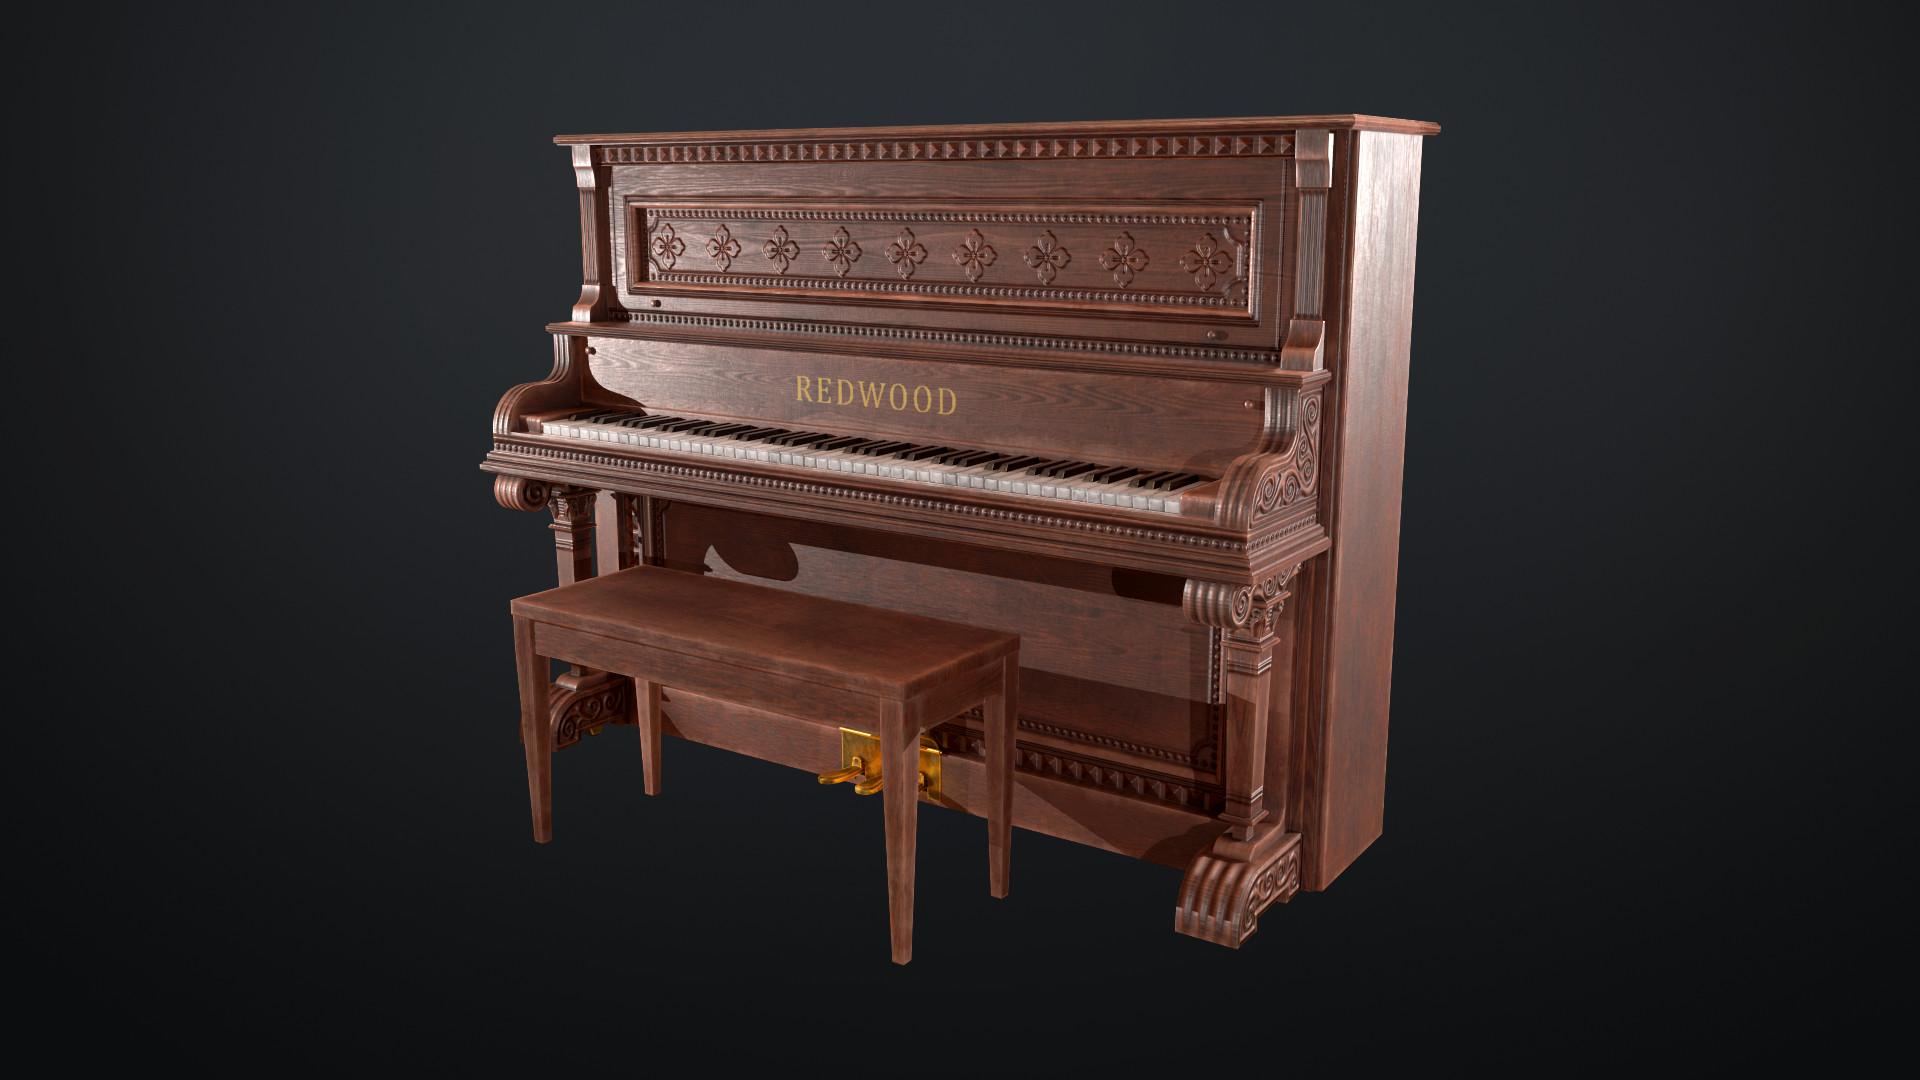 Sami tarvainen piano render 2